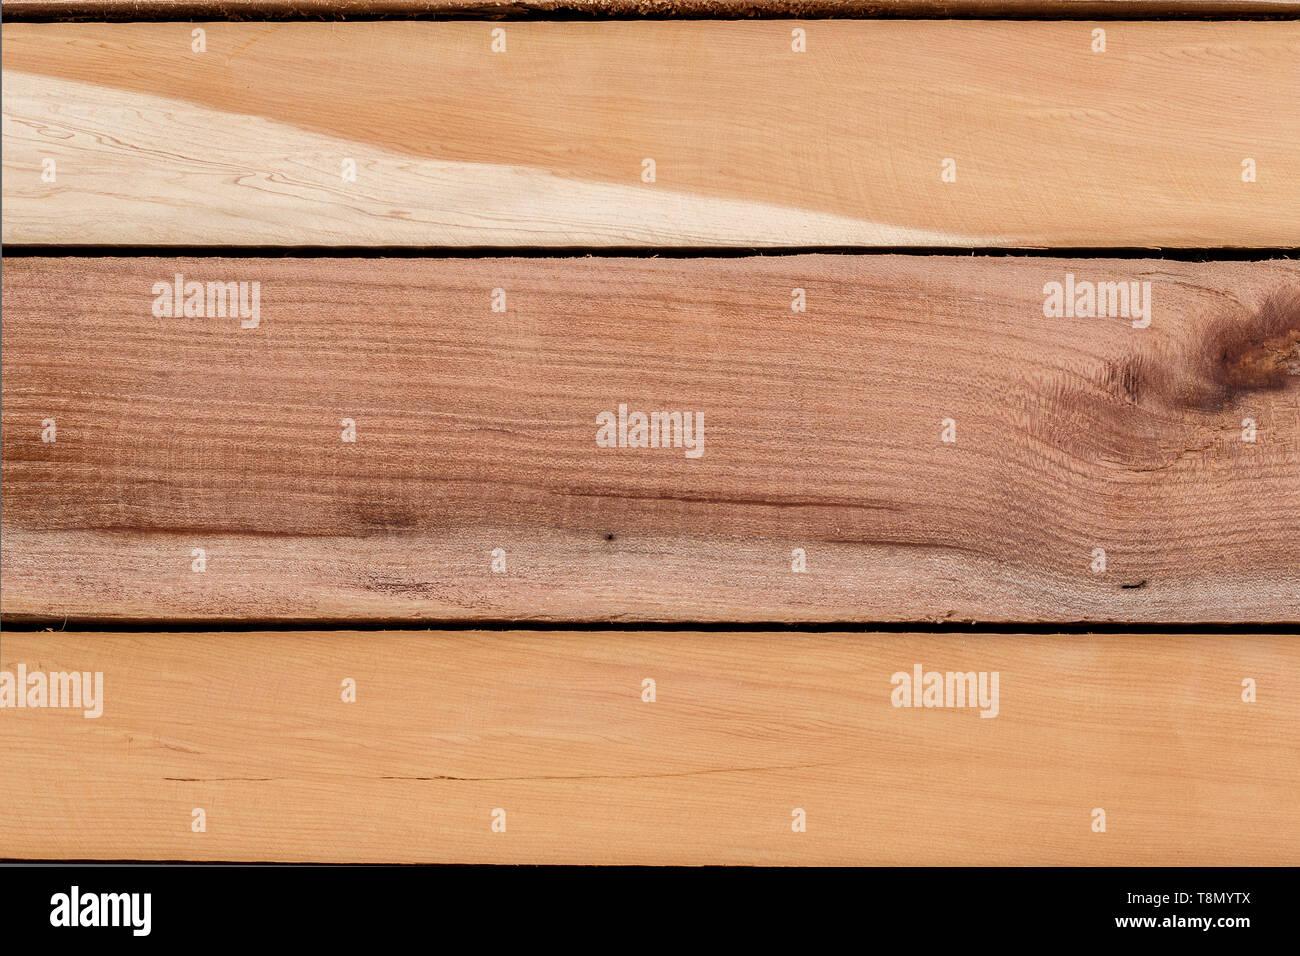 light wooden planks background - Stock Image